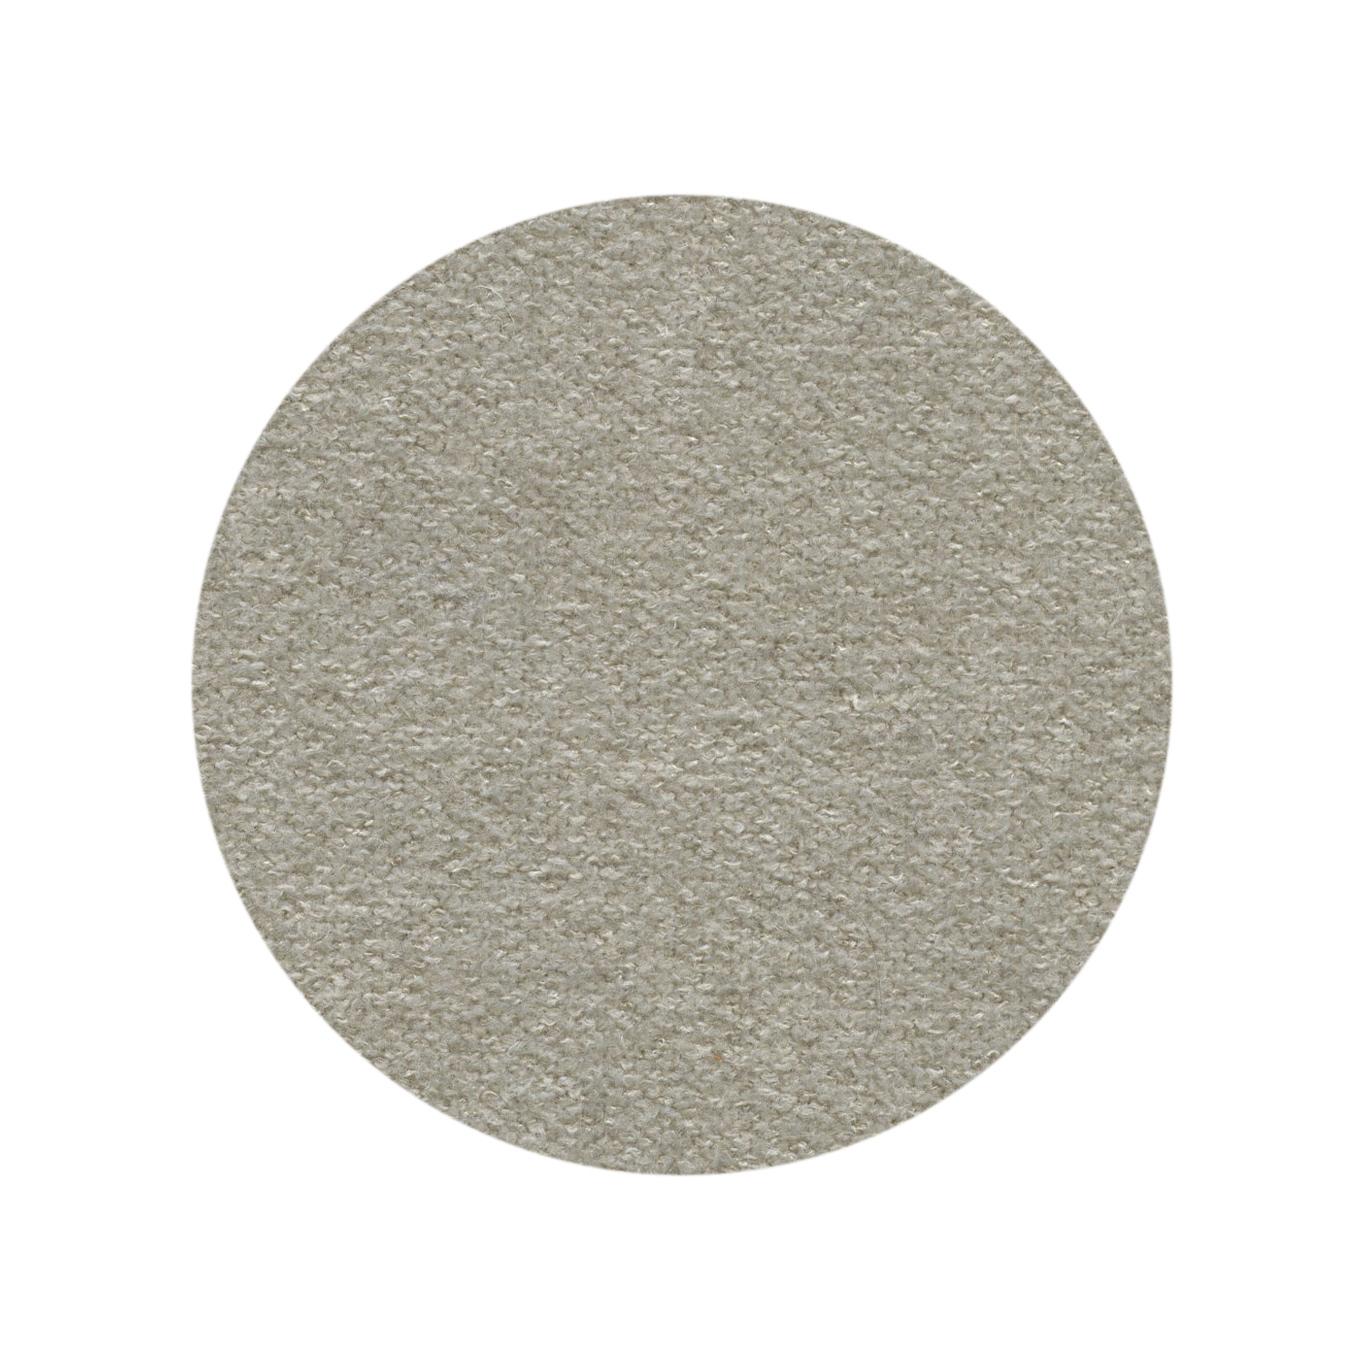 Marled Microfiber - Ash Gray